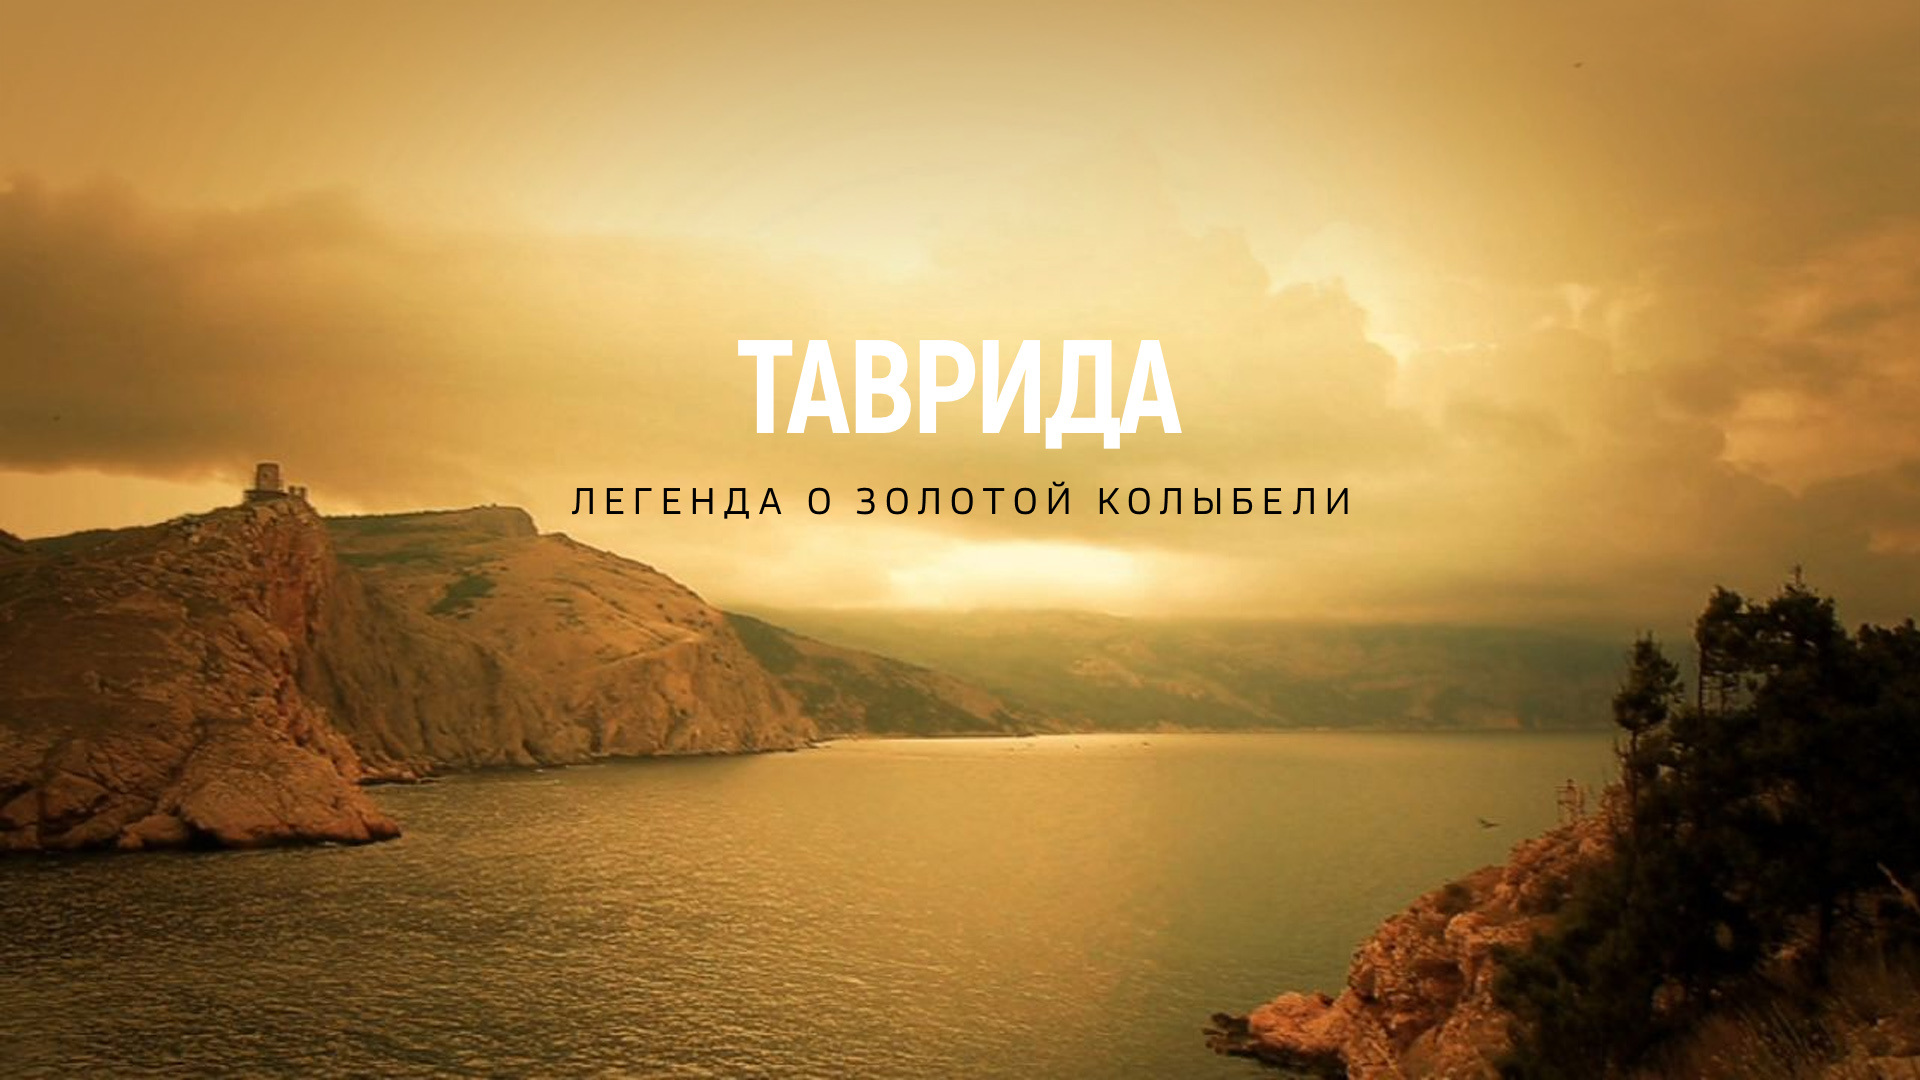 Таврида. Легенда о золотой колыбели